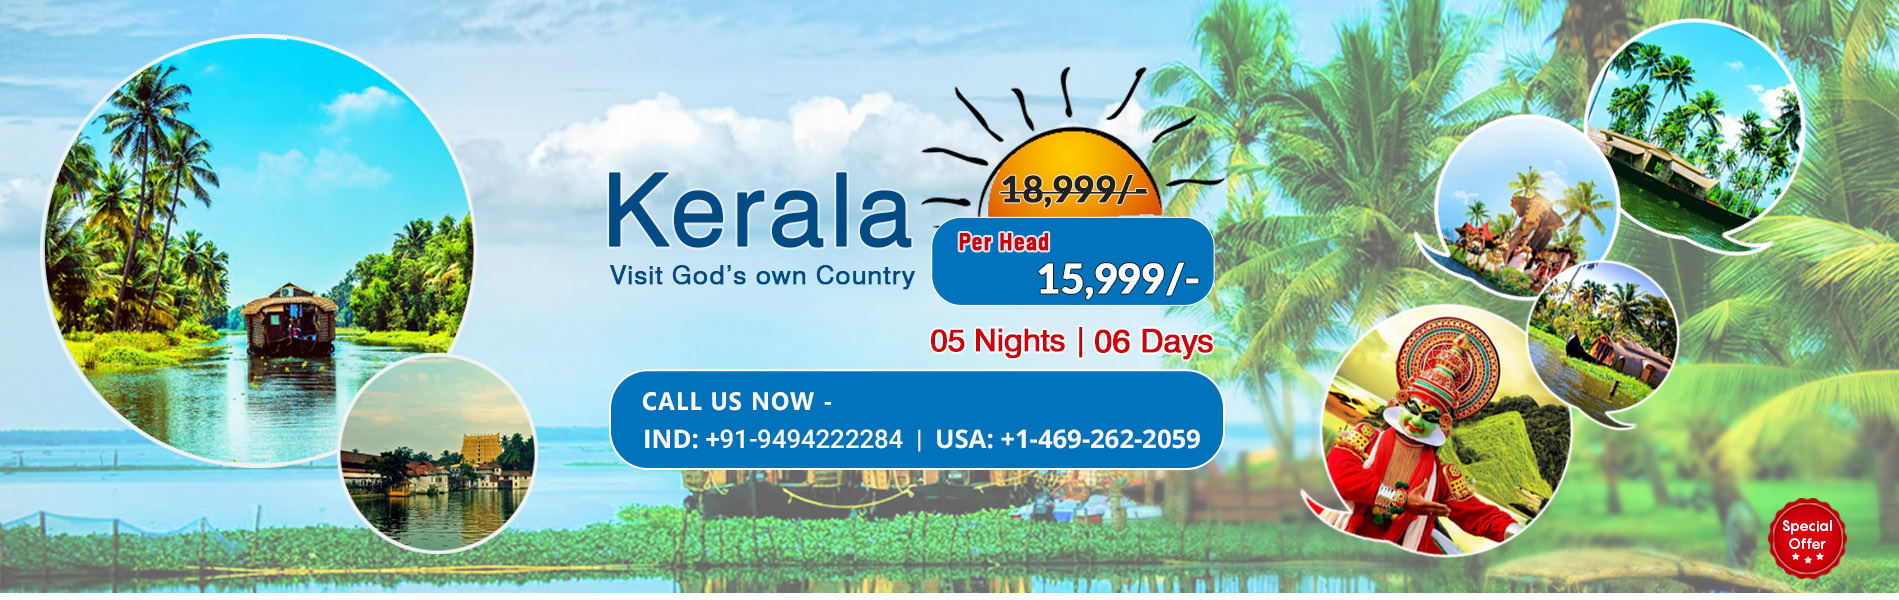 kerala-travel-package-triptyme